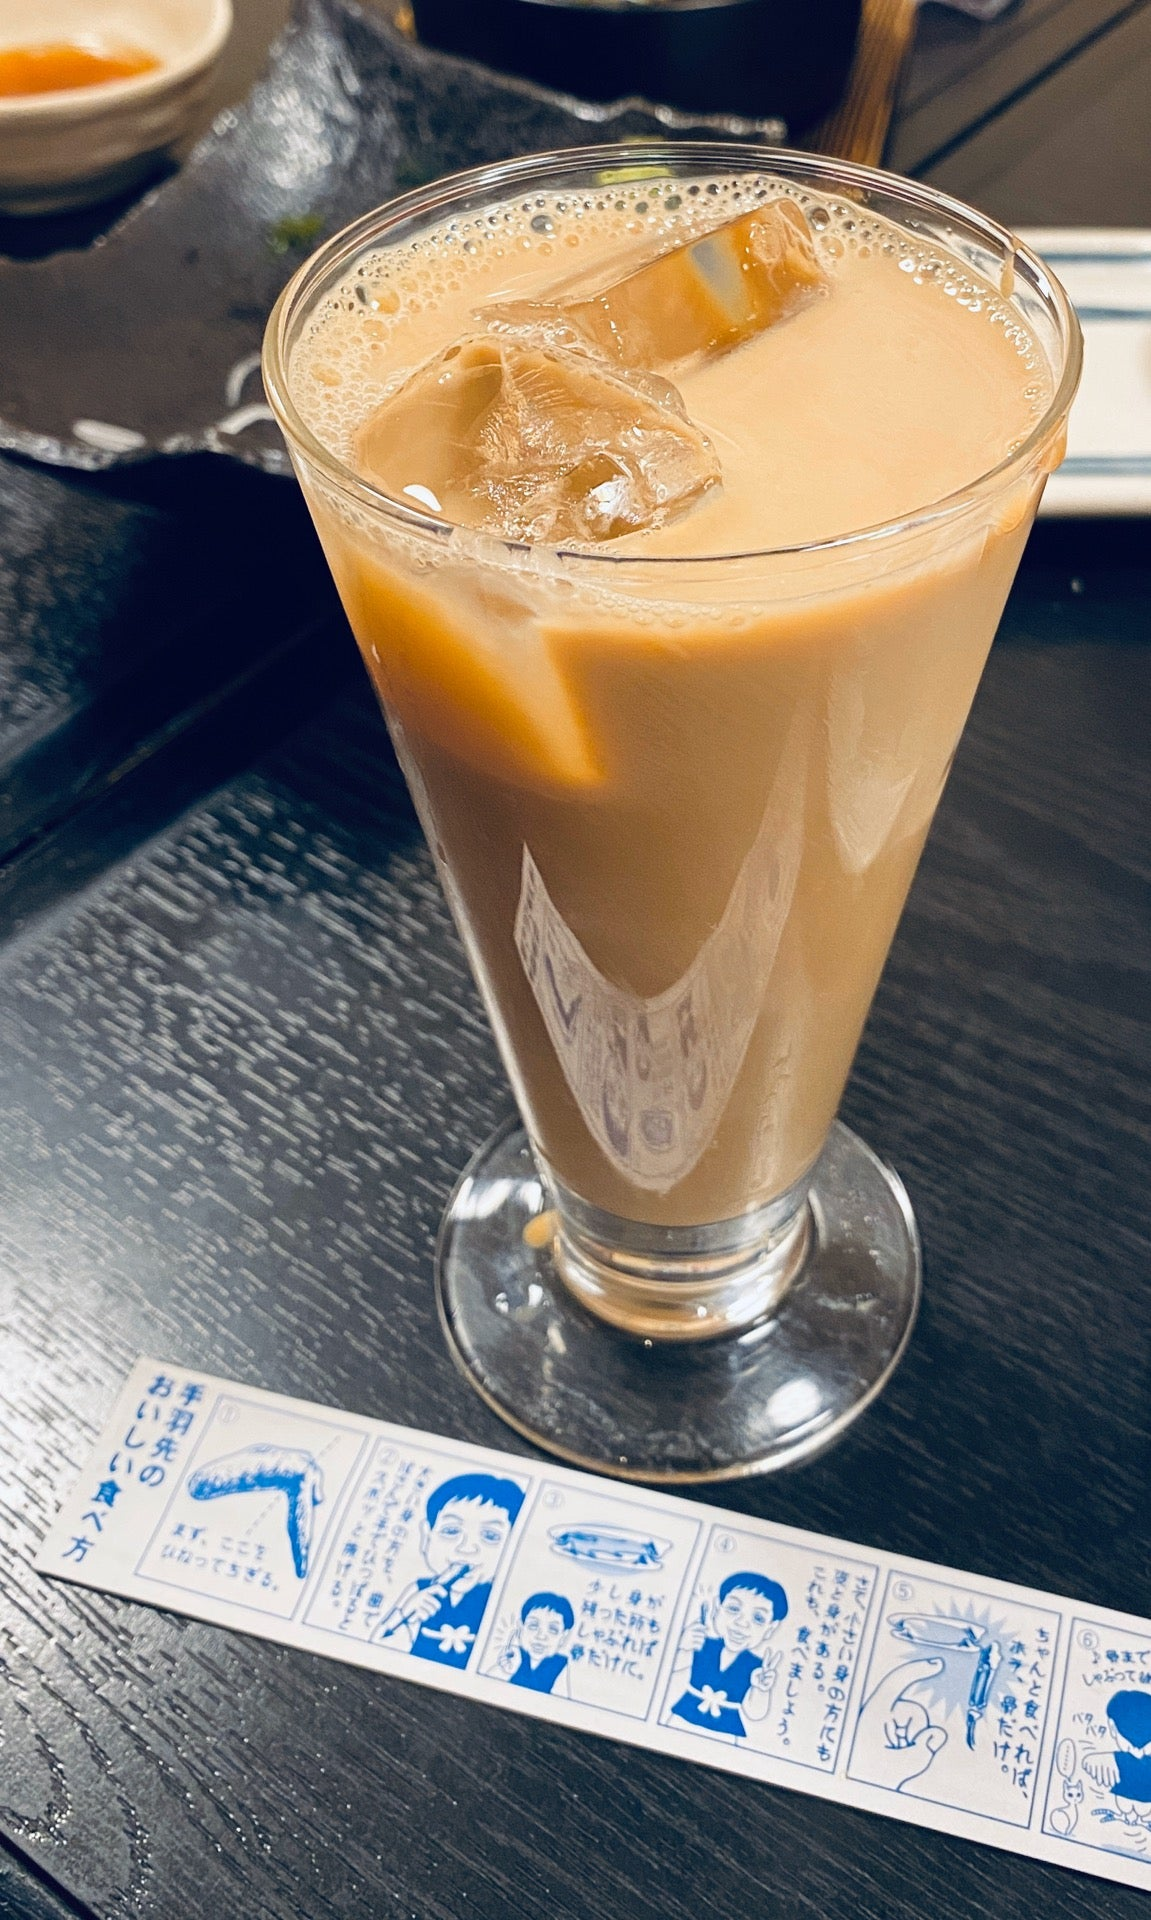 Royal Godiva Tea ロイヤル ゴディバティー。ゴディバのお酒 キタ━━━(゚∀゚)━━━!! (@ 世界の山ちゃん 駅西4号店 in 名古屋市, 愛知県, 愛知県) https://t.co/rMaaugPG69 https://t.co/dyG8BU29IF